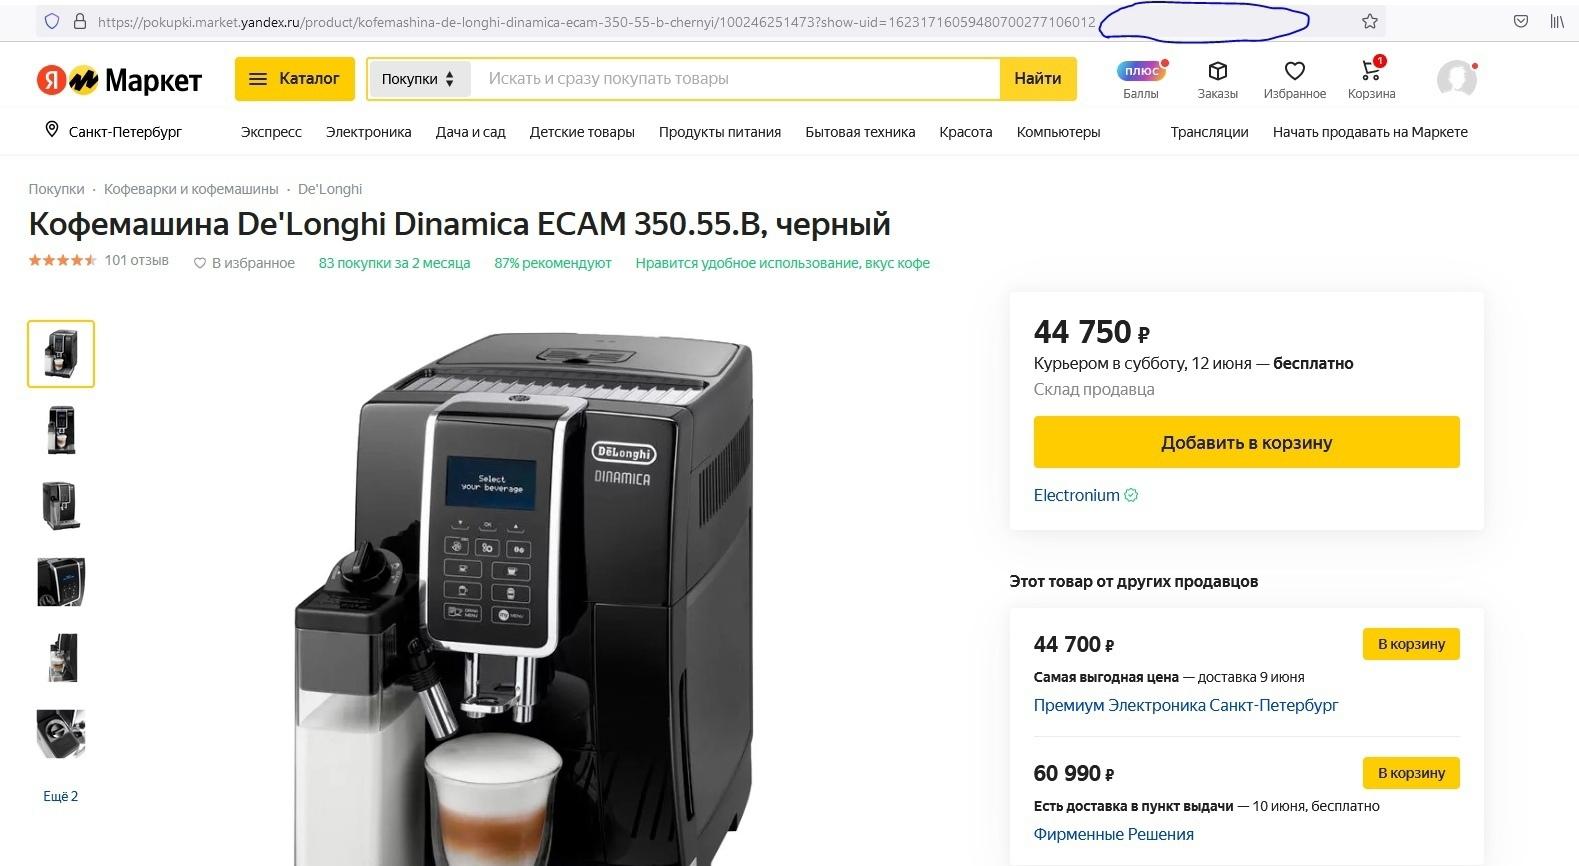 Яндекс, ты уху ел?)